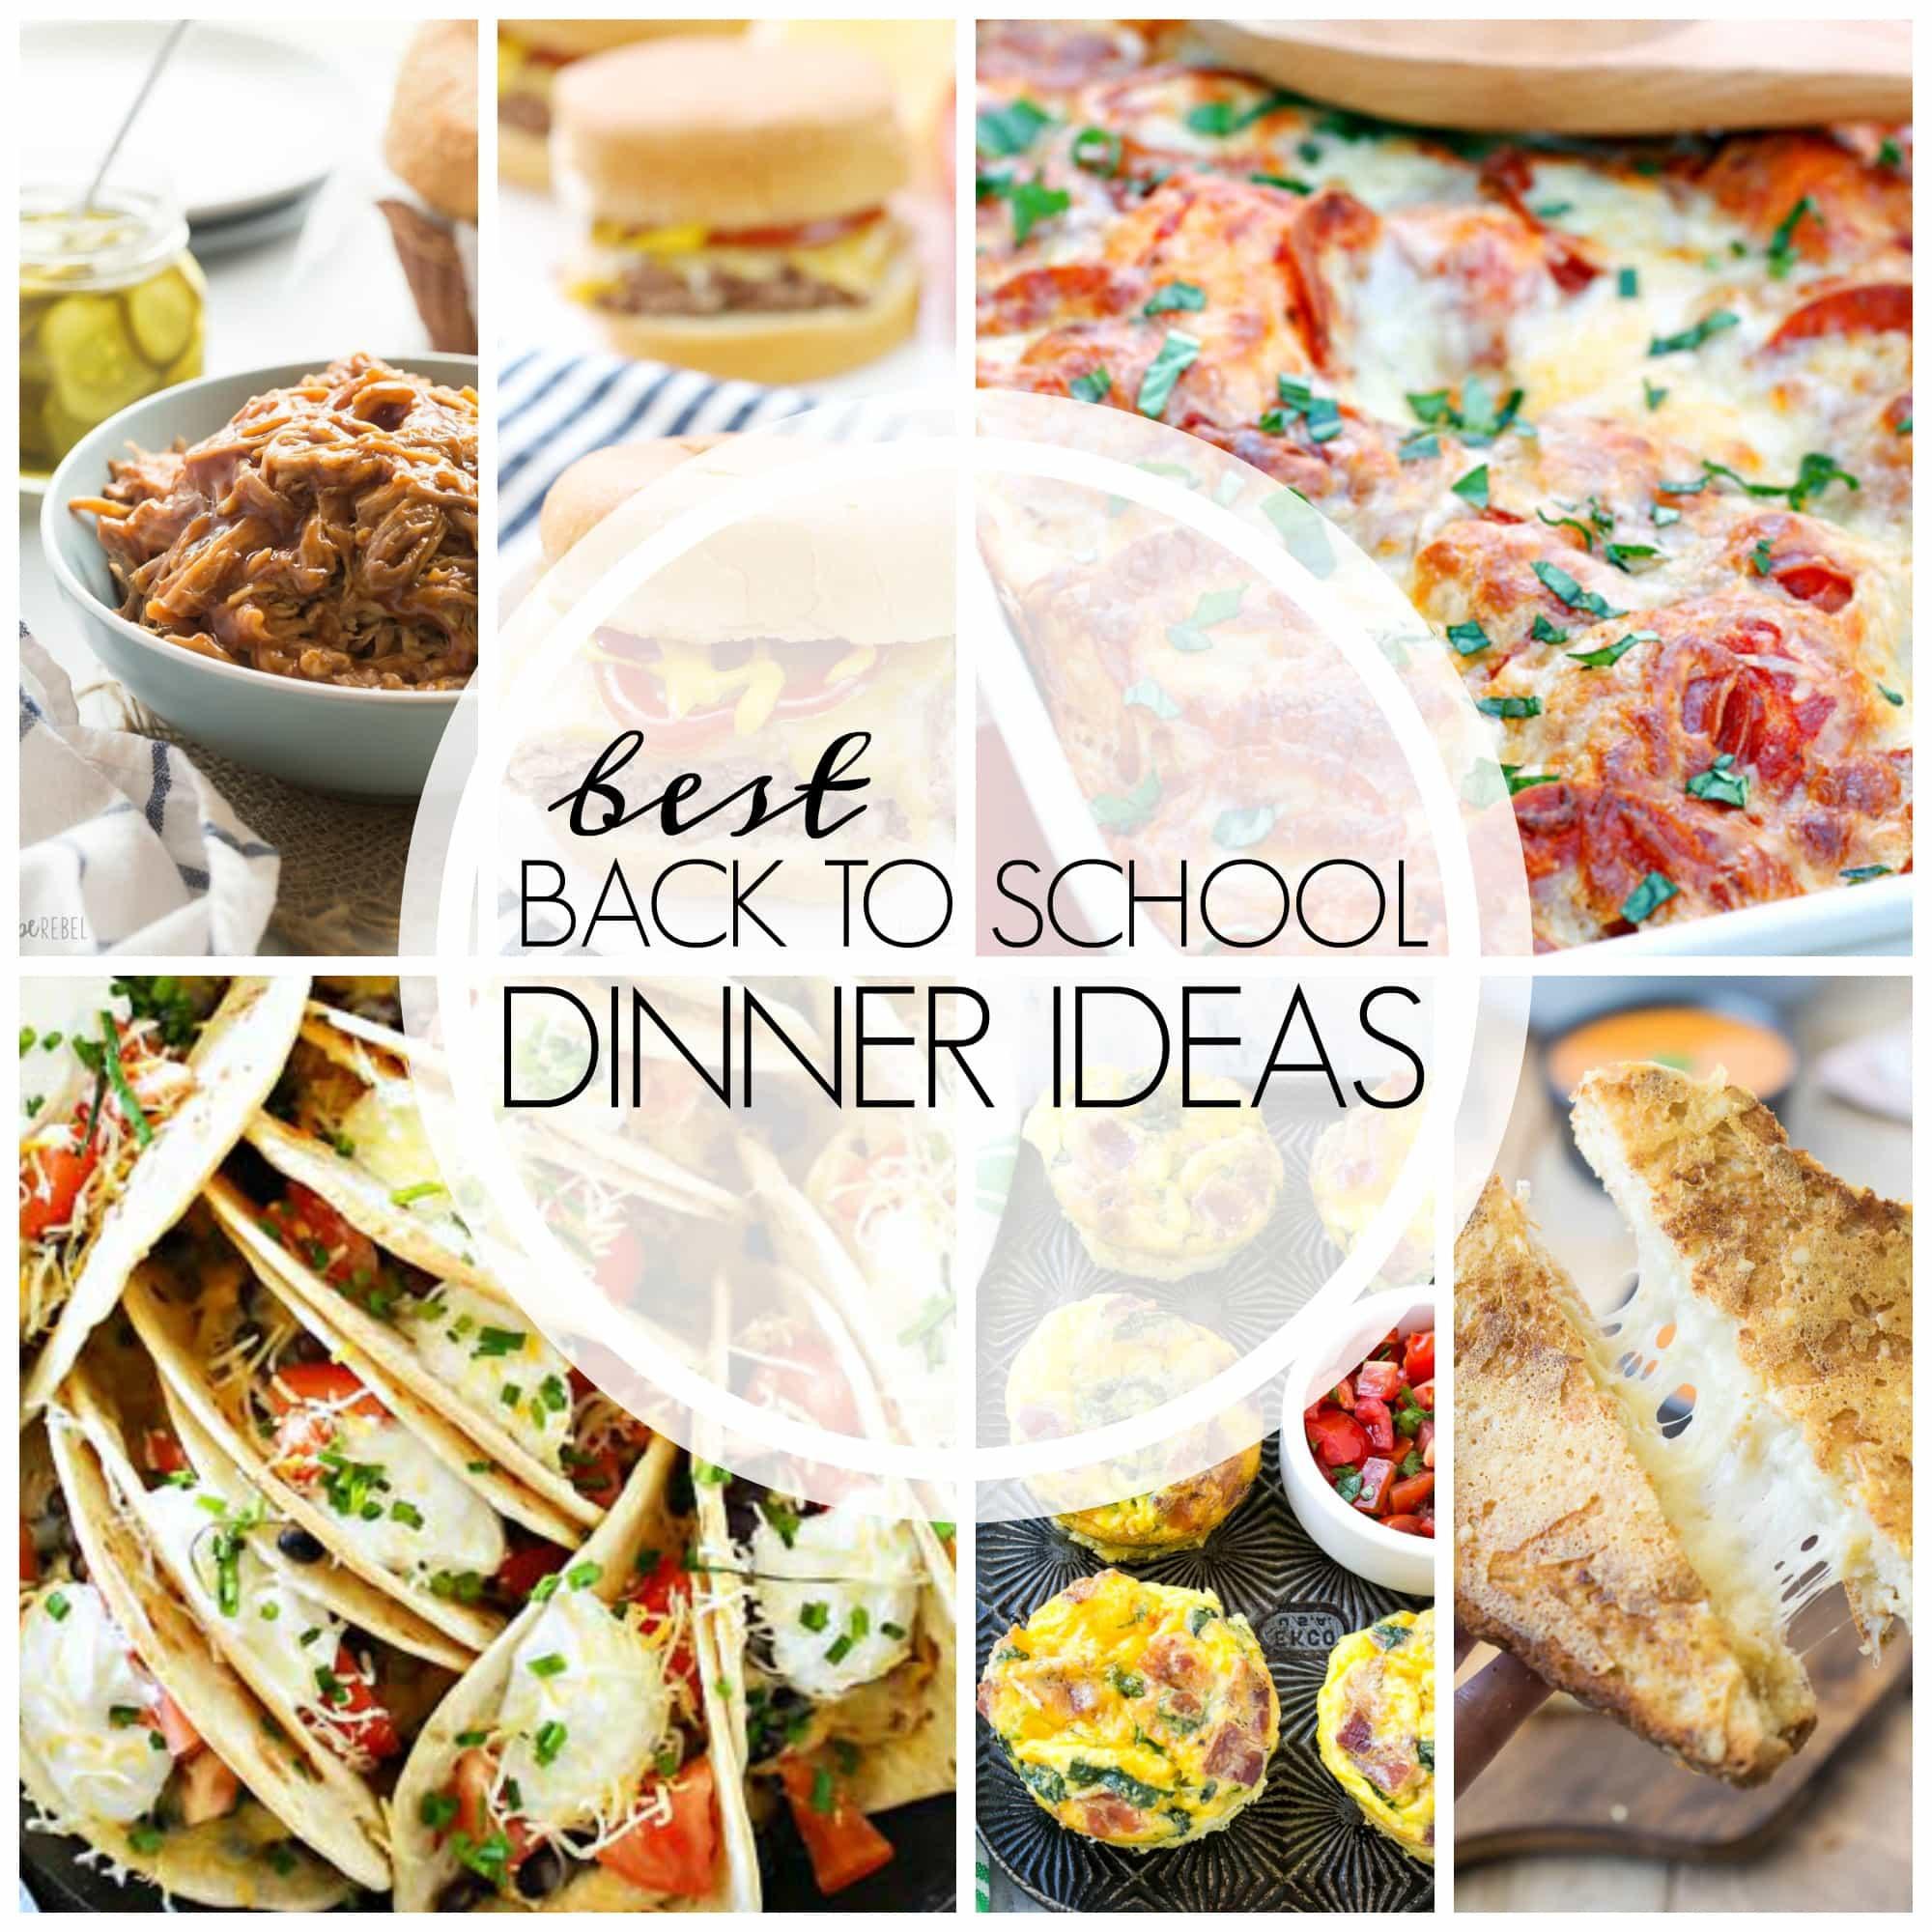 Dinner Ideas Easy  Easy Dinner Recipes 20 Family Friendly Ideas